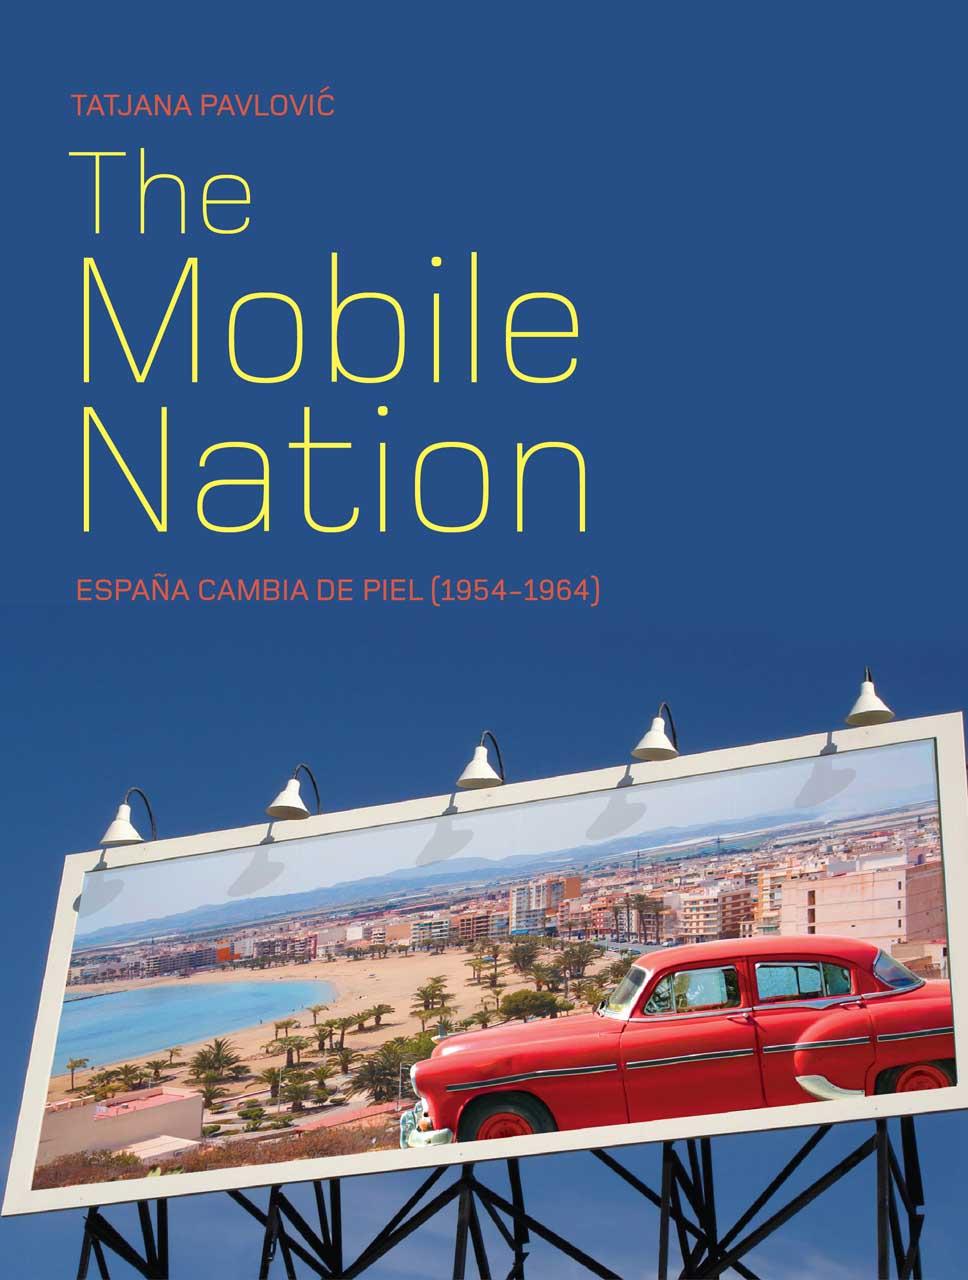 The Mobile Nation – Espana Cambia de piel (1954– 1964)